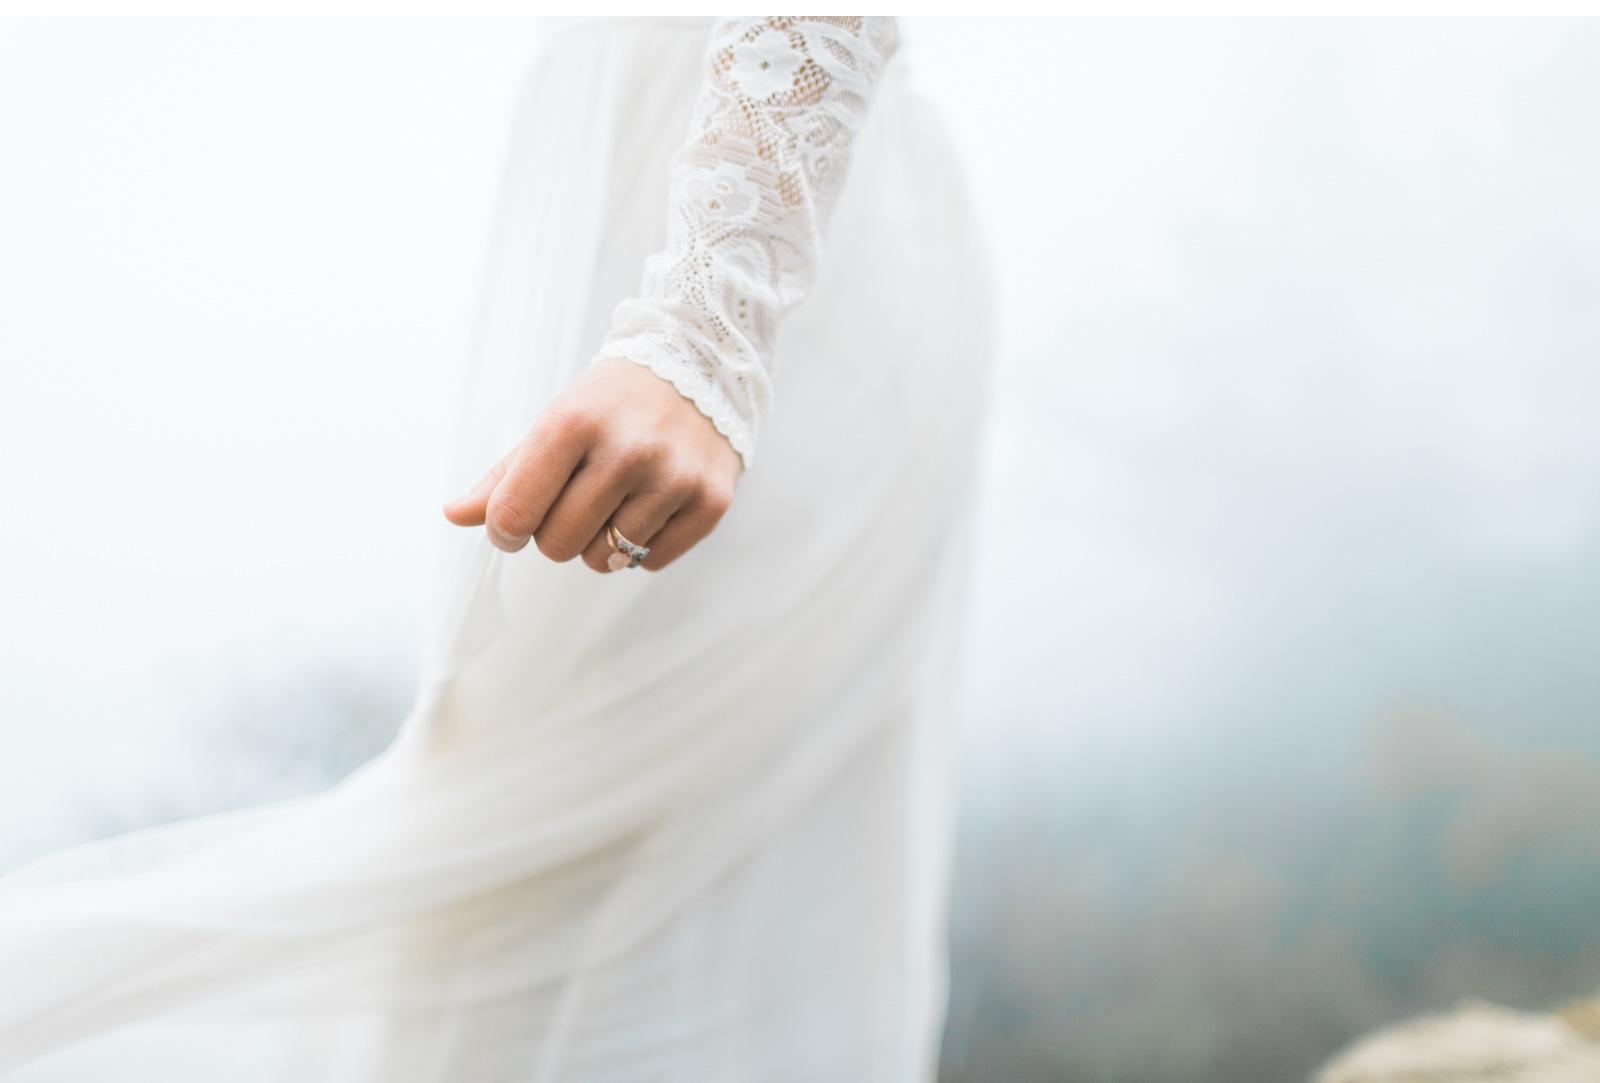 Knapps-Castle-Wedding-Natalie-Schutt-Photography_08.jpg